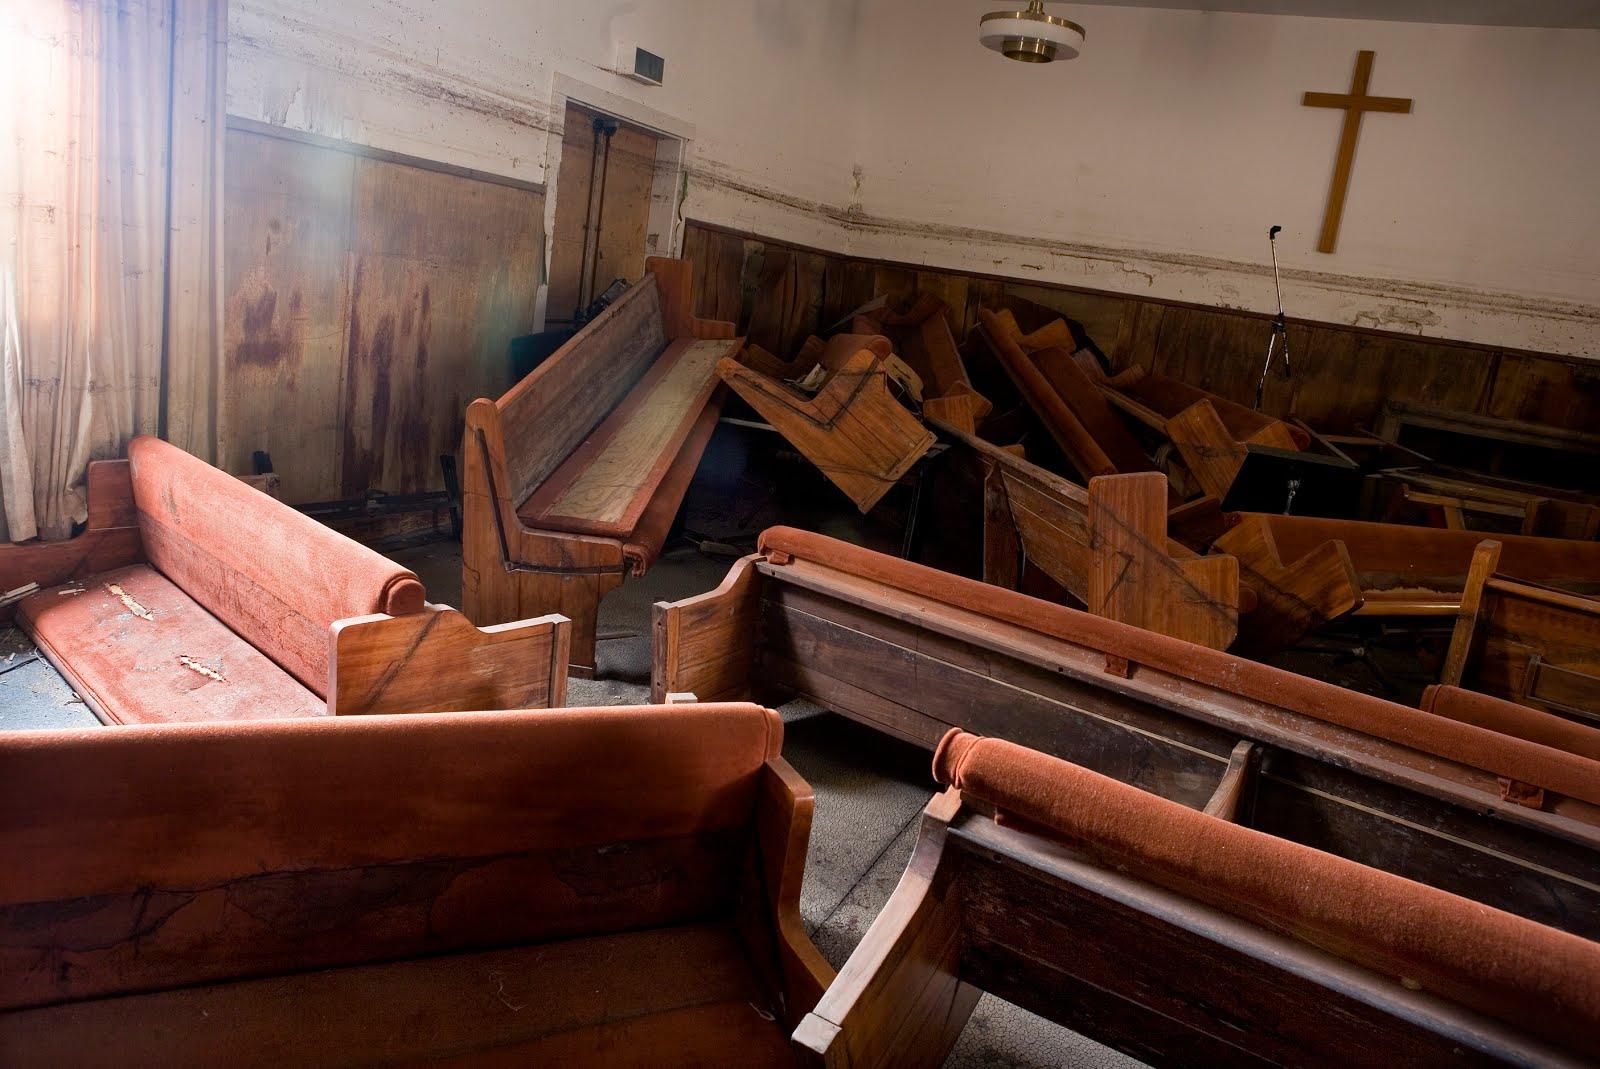 After The Flood: Korean Church